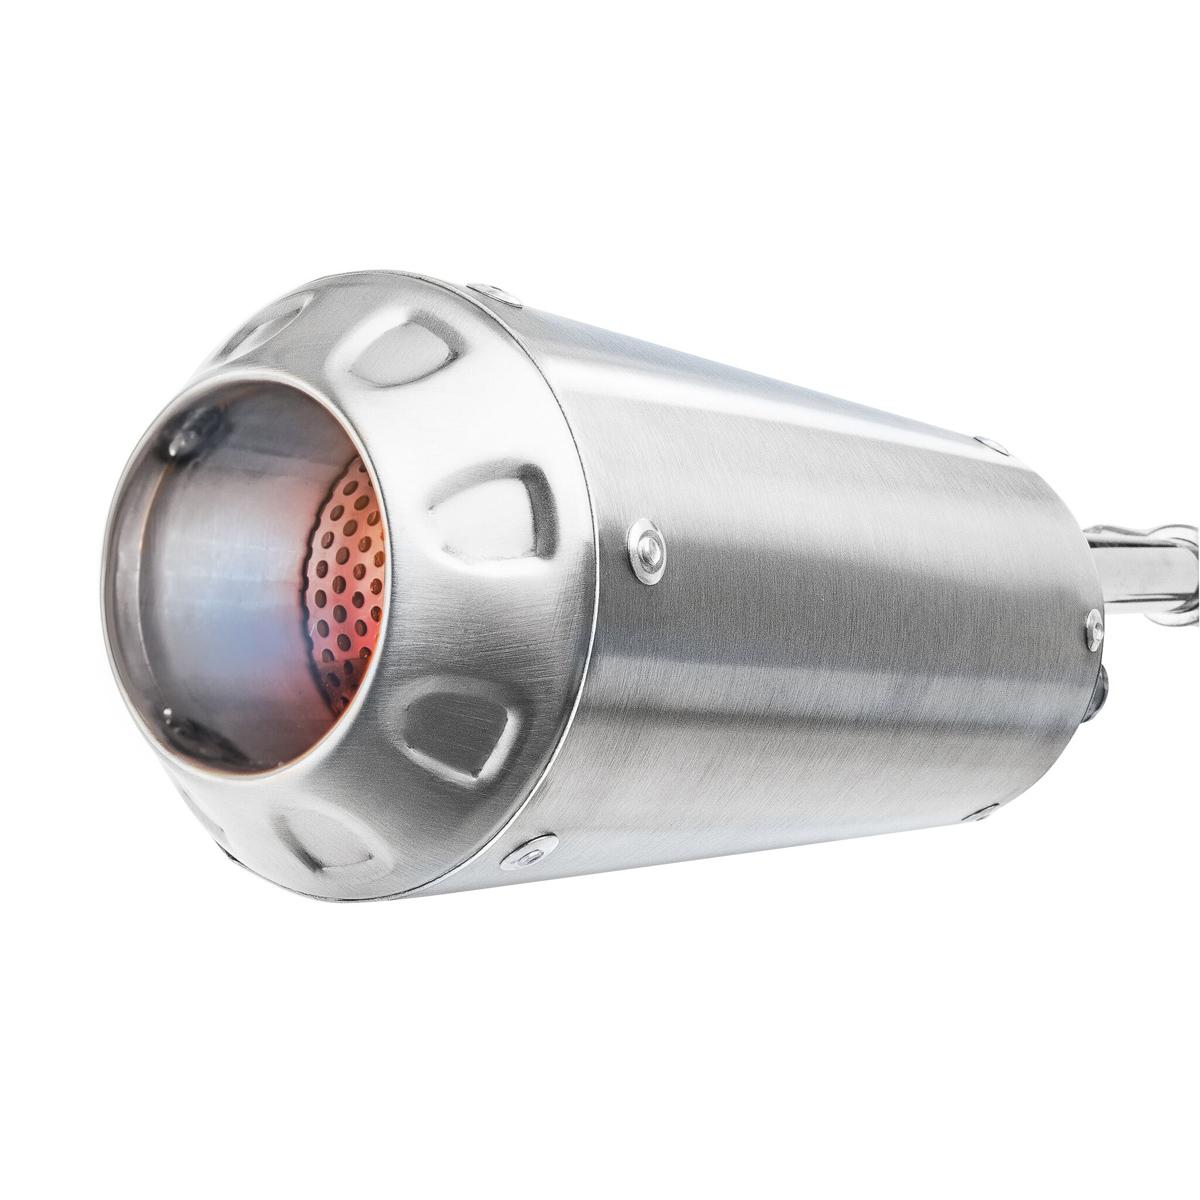 Hotbodies MGP II Stainless Slip-On Exhaust